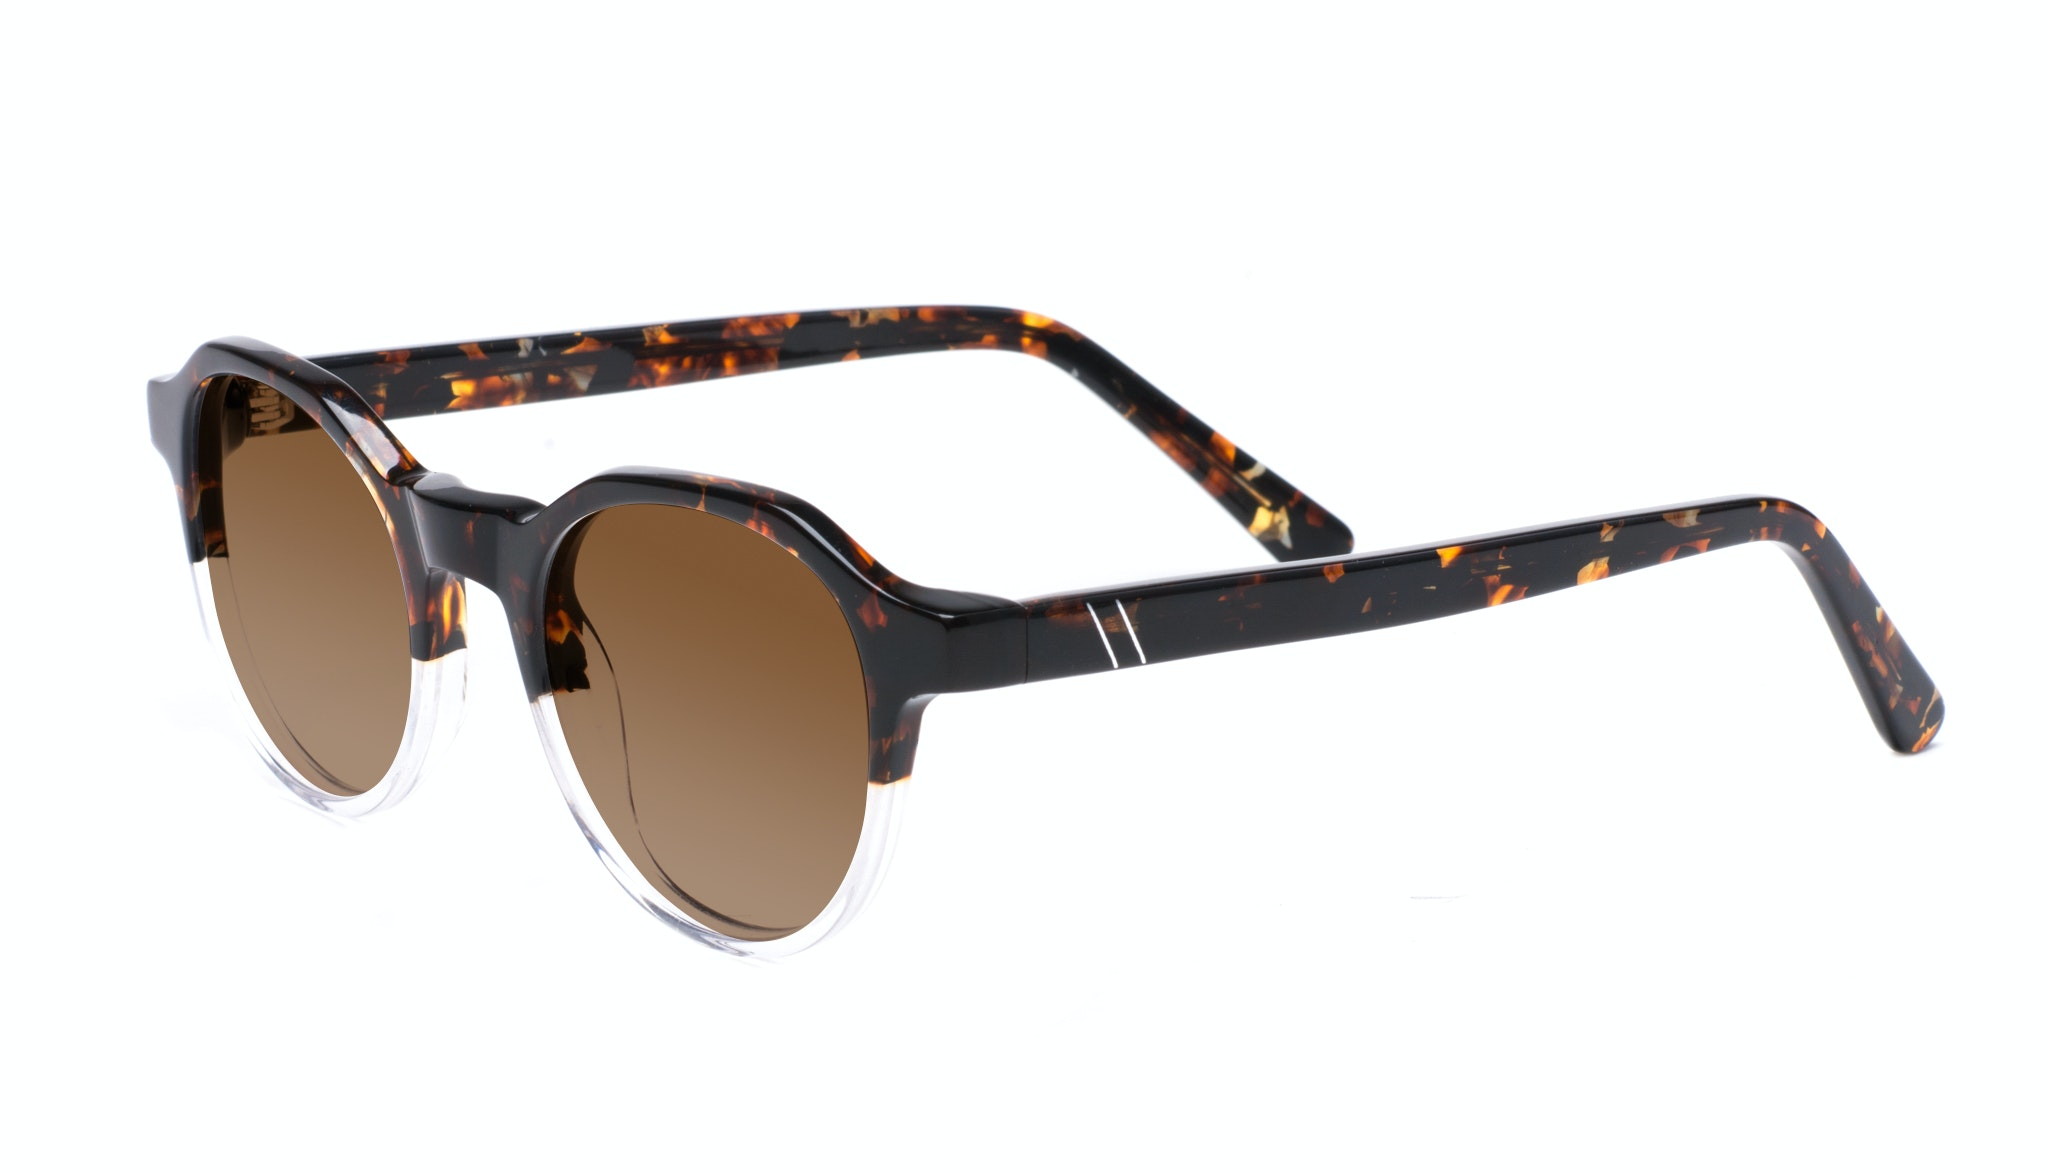 Affordable Fashion Glasses Round Sunglasses Men Form Mahogany Clear Tilt